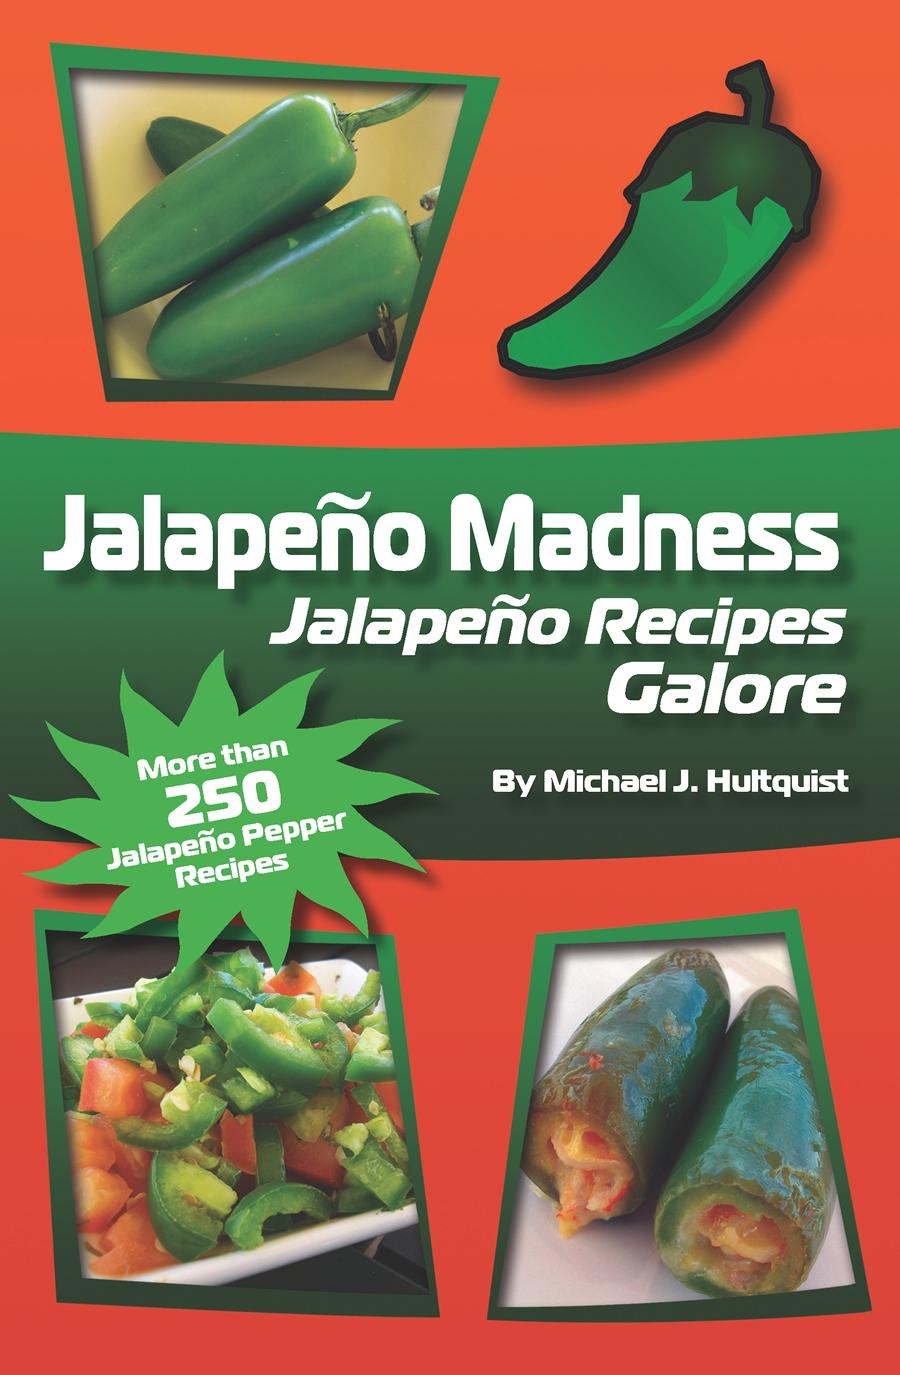 Jalapeno Madness: Jalapeno Recipes Galore!